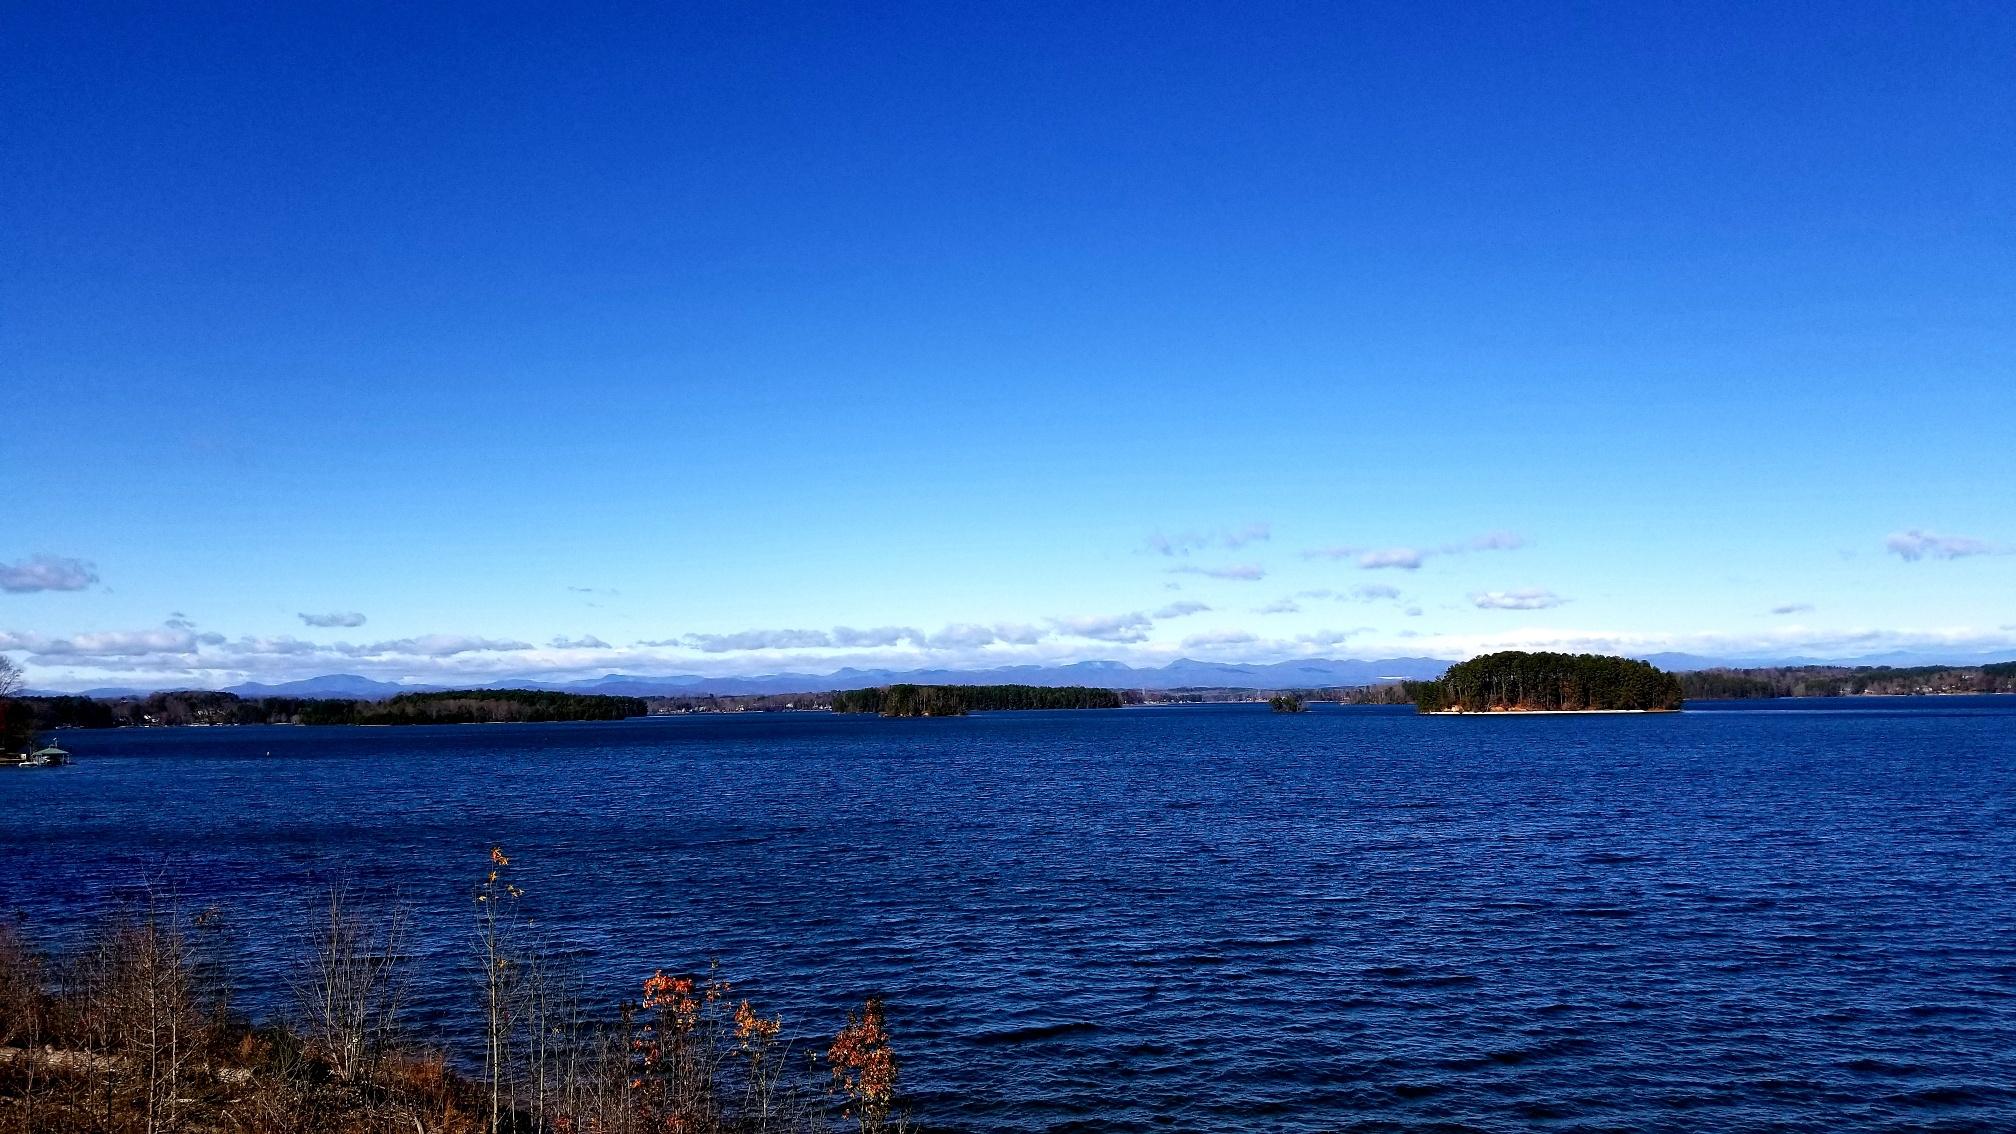 Christmas 2021 On Lake Keowee